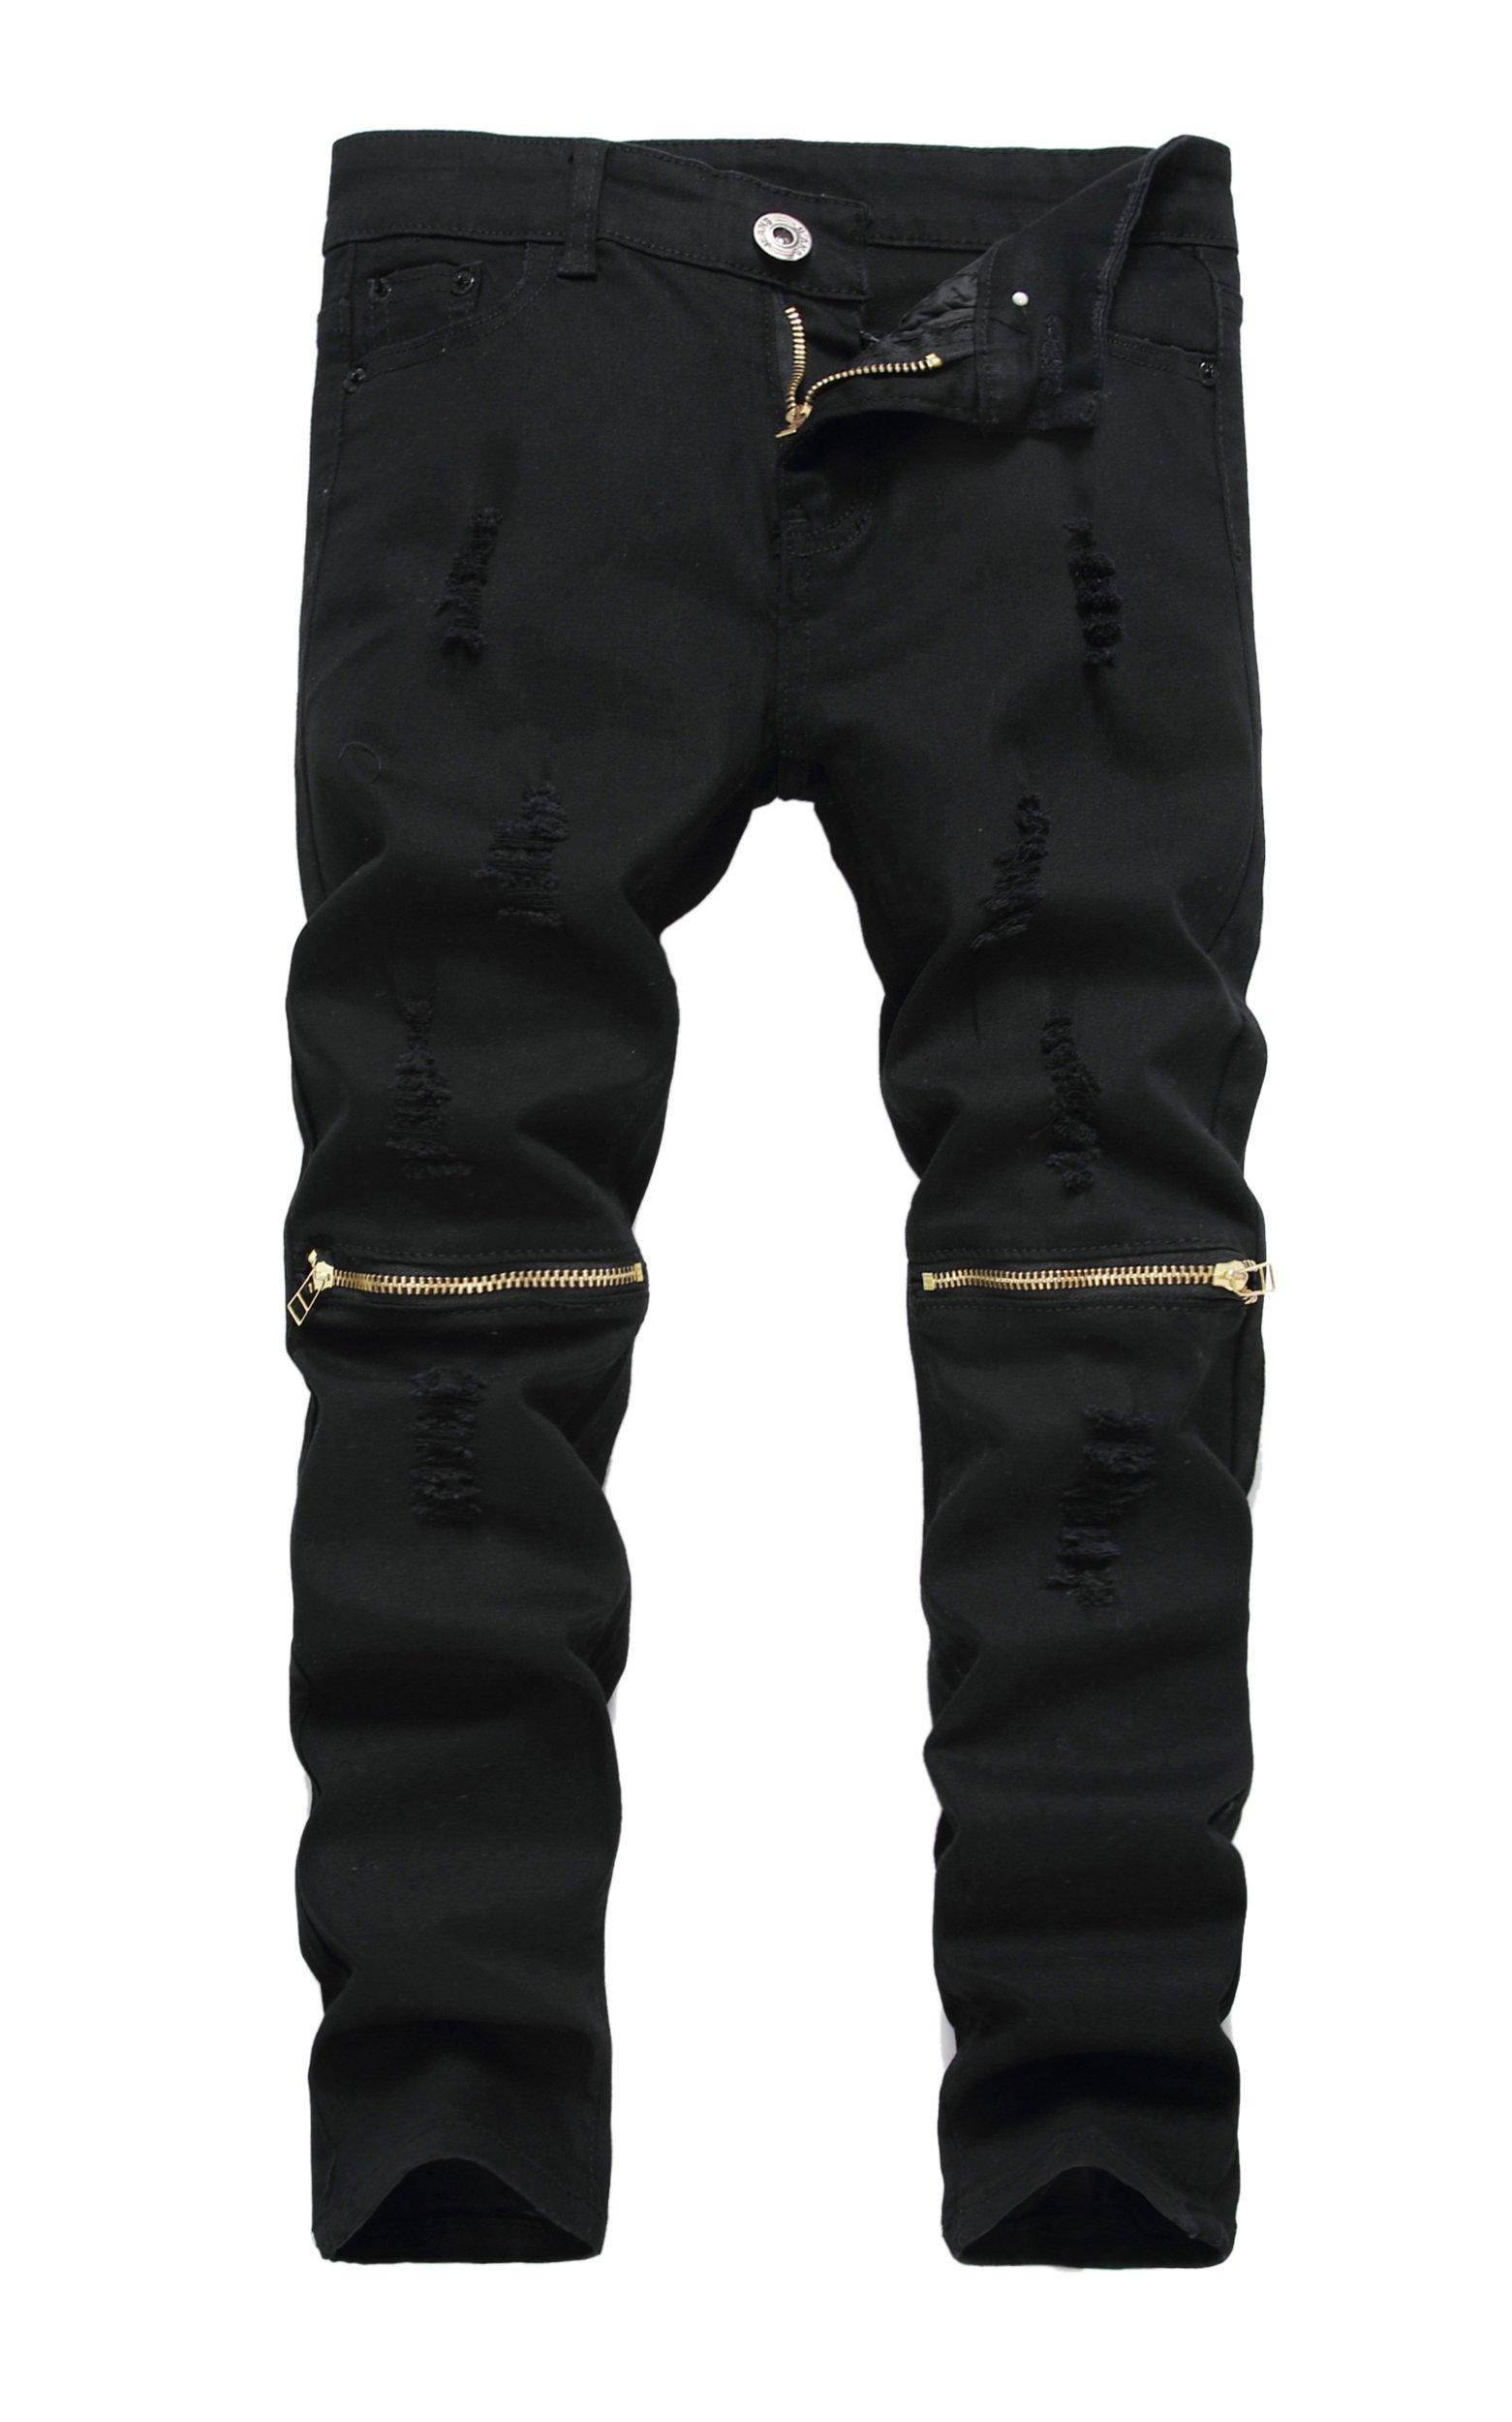 Boy's Black Slim Fit Skinny Jeans Ripped Elastic Waist Pants with Zipper for Kids,Black,10 Slim by FREDD MARSHALL